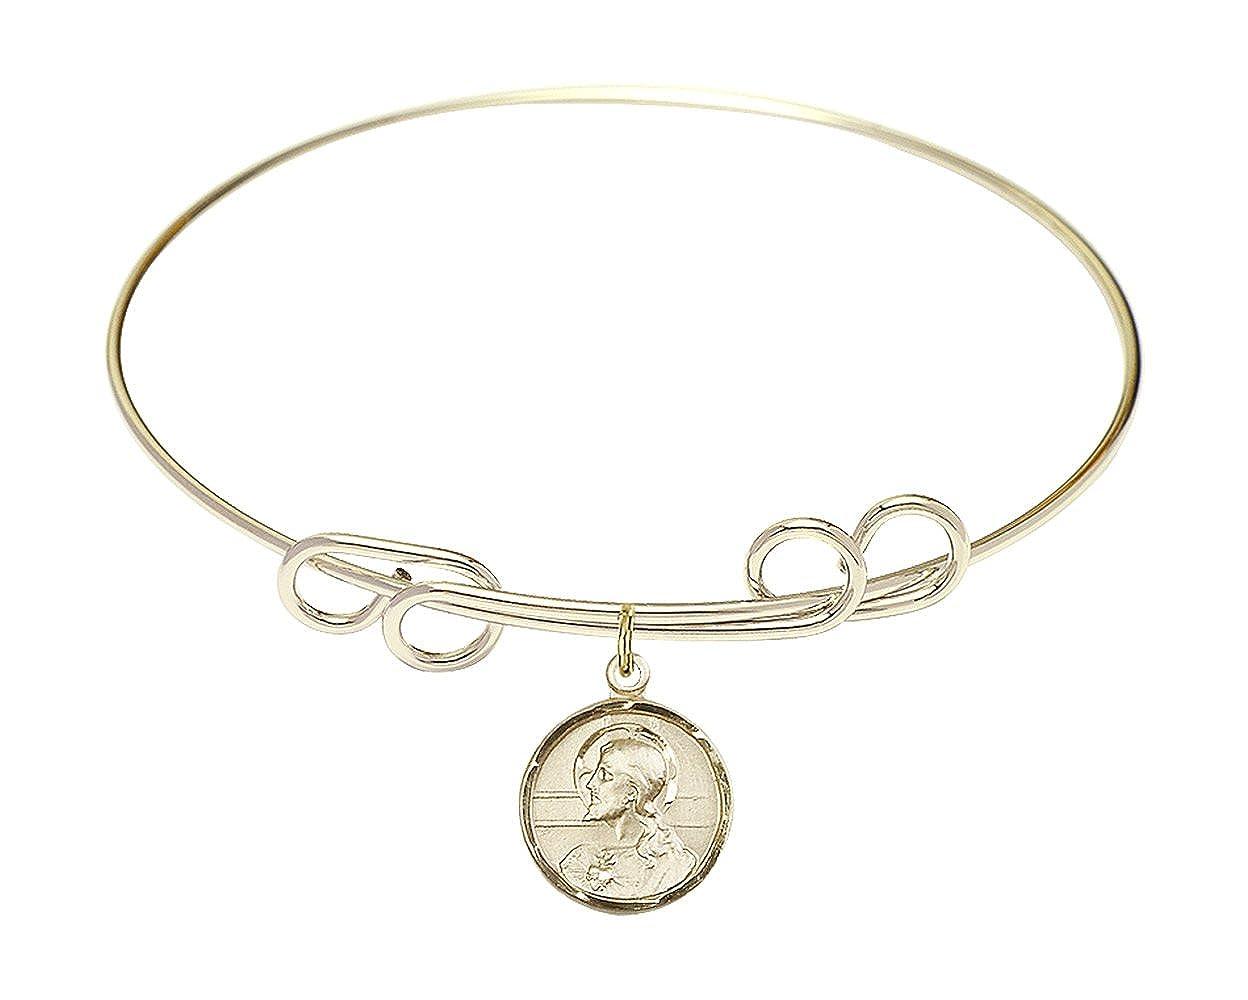 Bonyak Jewelry Round Double Loop Bangle Bracelet w//Scapular in Gold-Filled